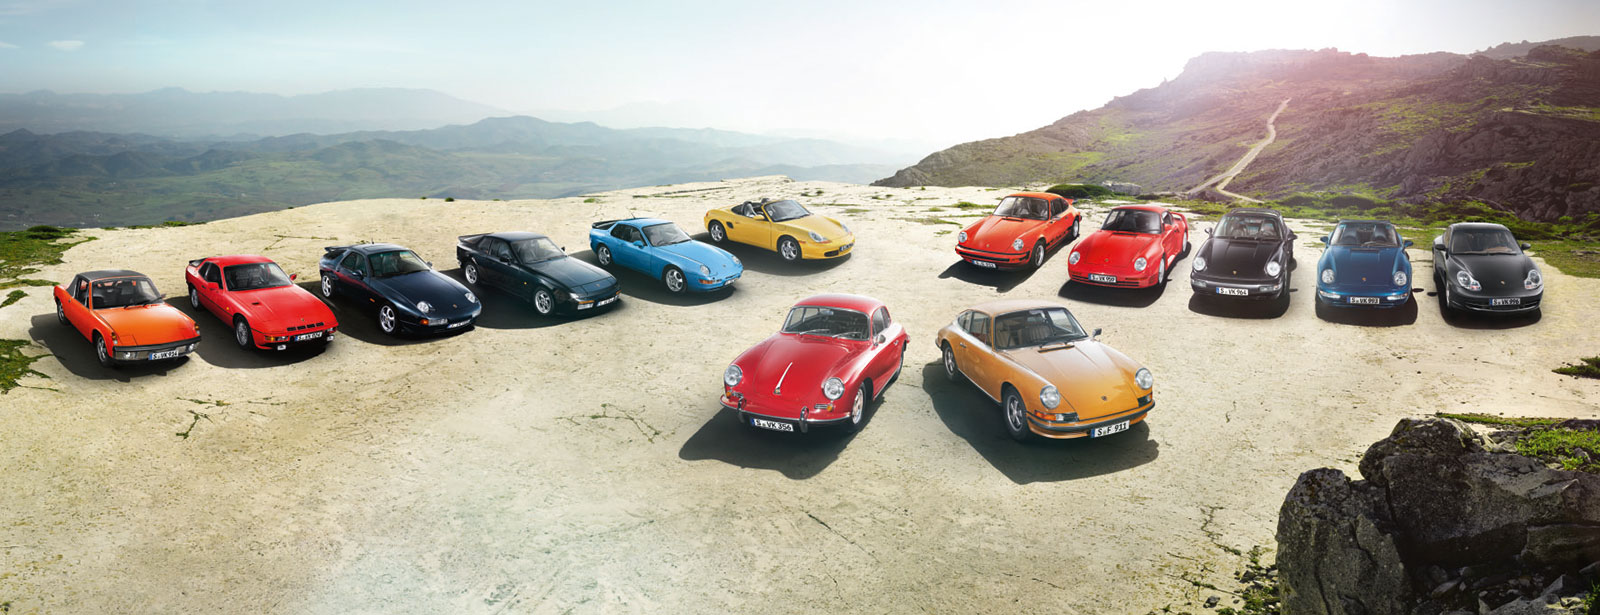 Porsche Classic Partner | Porsche Classic